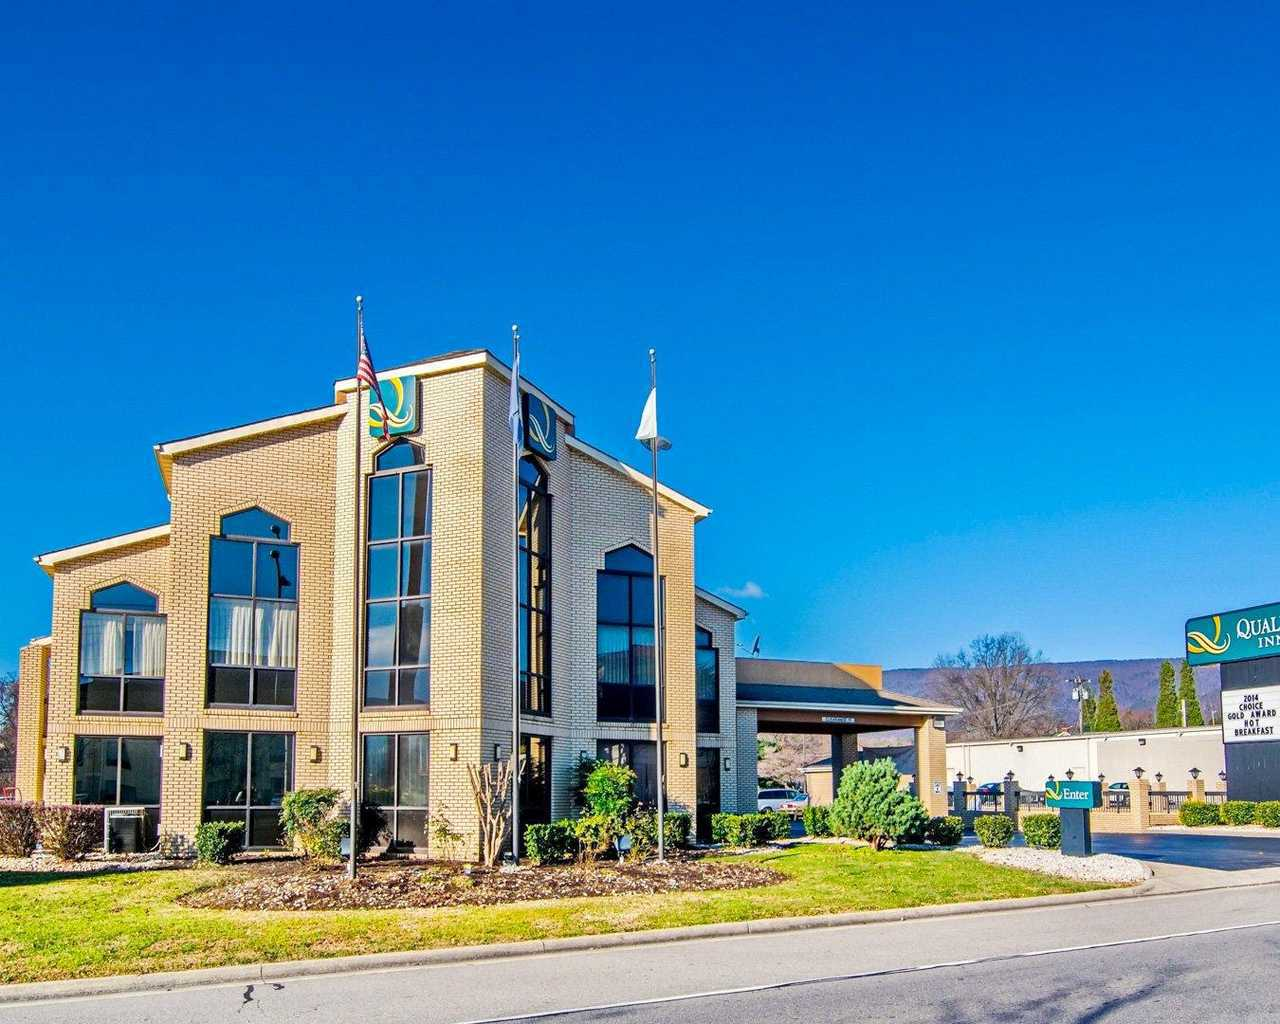 Quality Inn Salem, Salem, VA Jobs   Hospitality Online